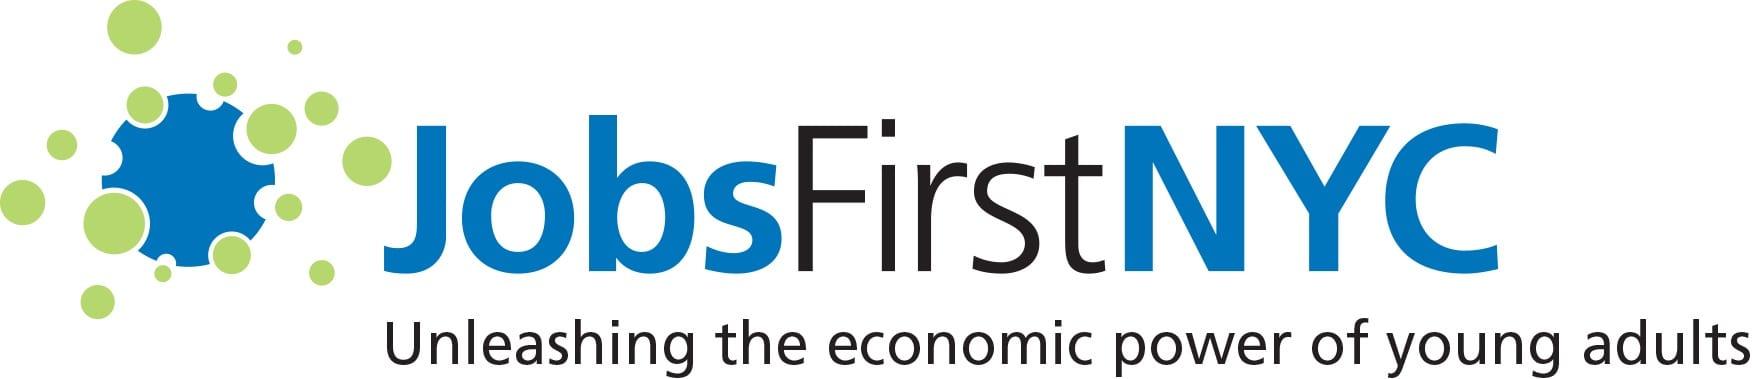 JobsFirstNYC logo